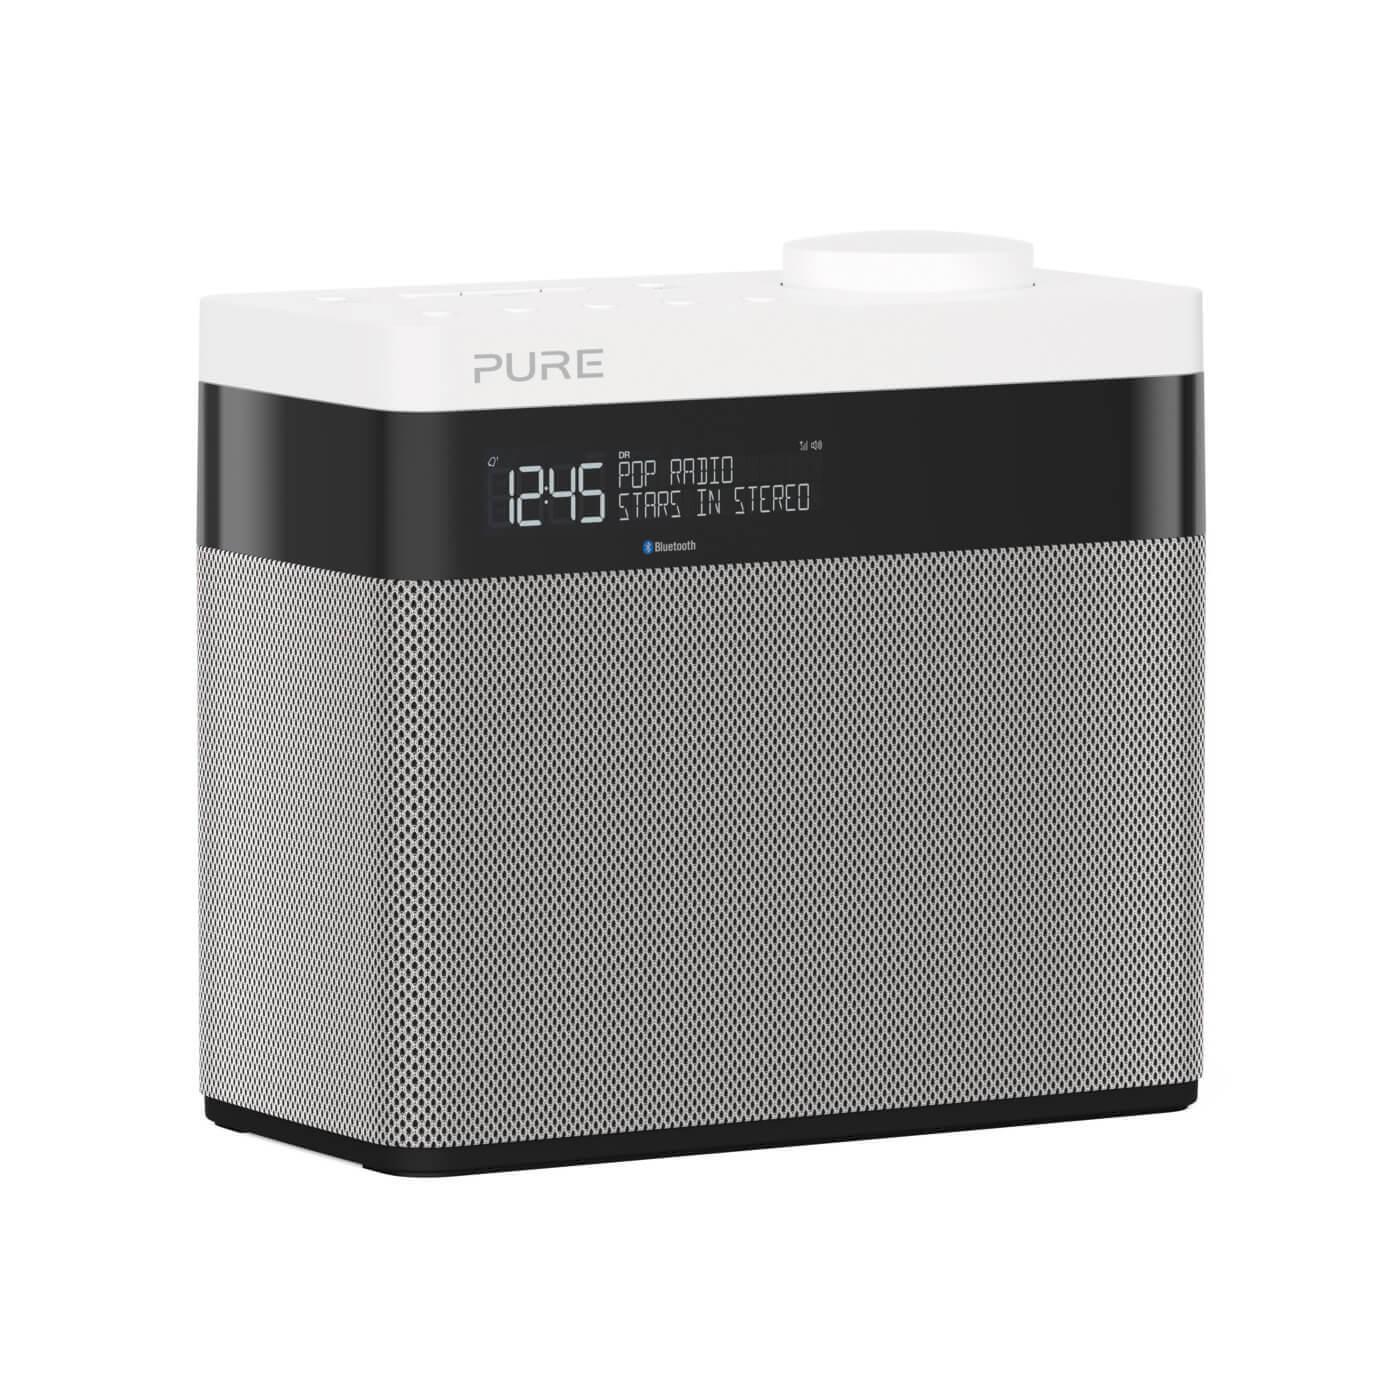 Pure - Pop Maxi Bluetooth DAB+ radio Bluetooth, DAB+, FM